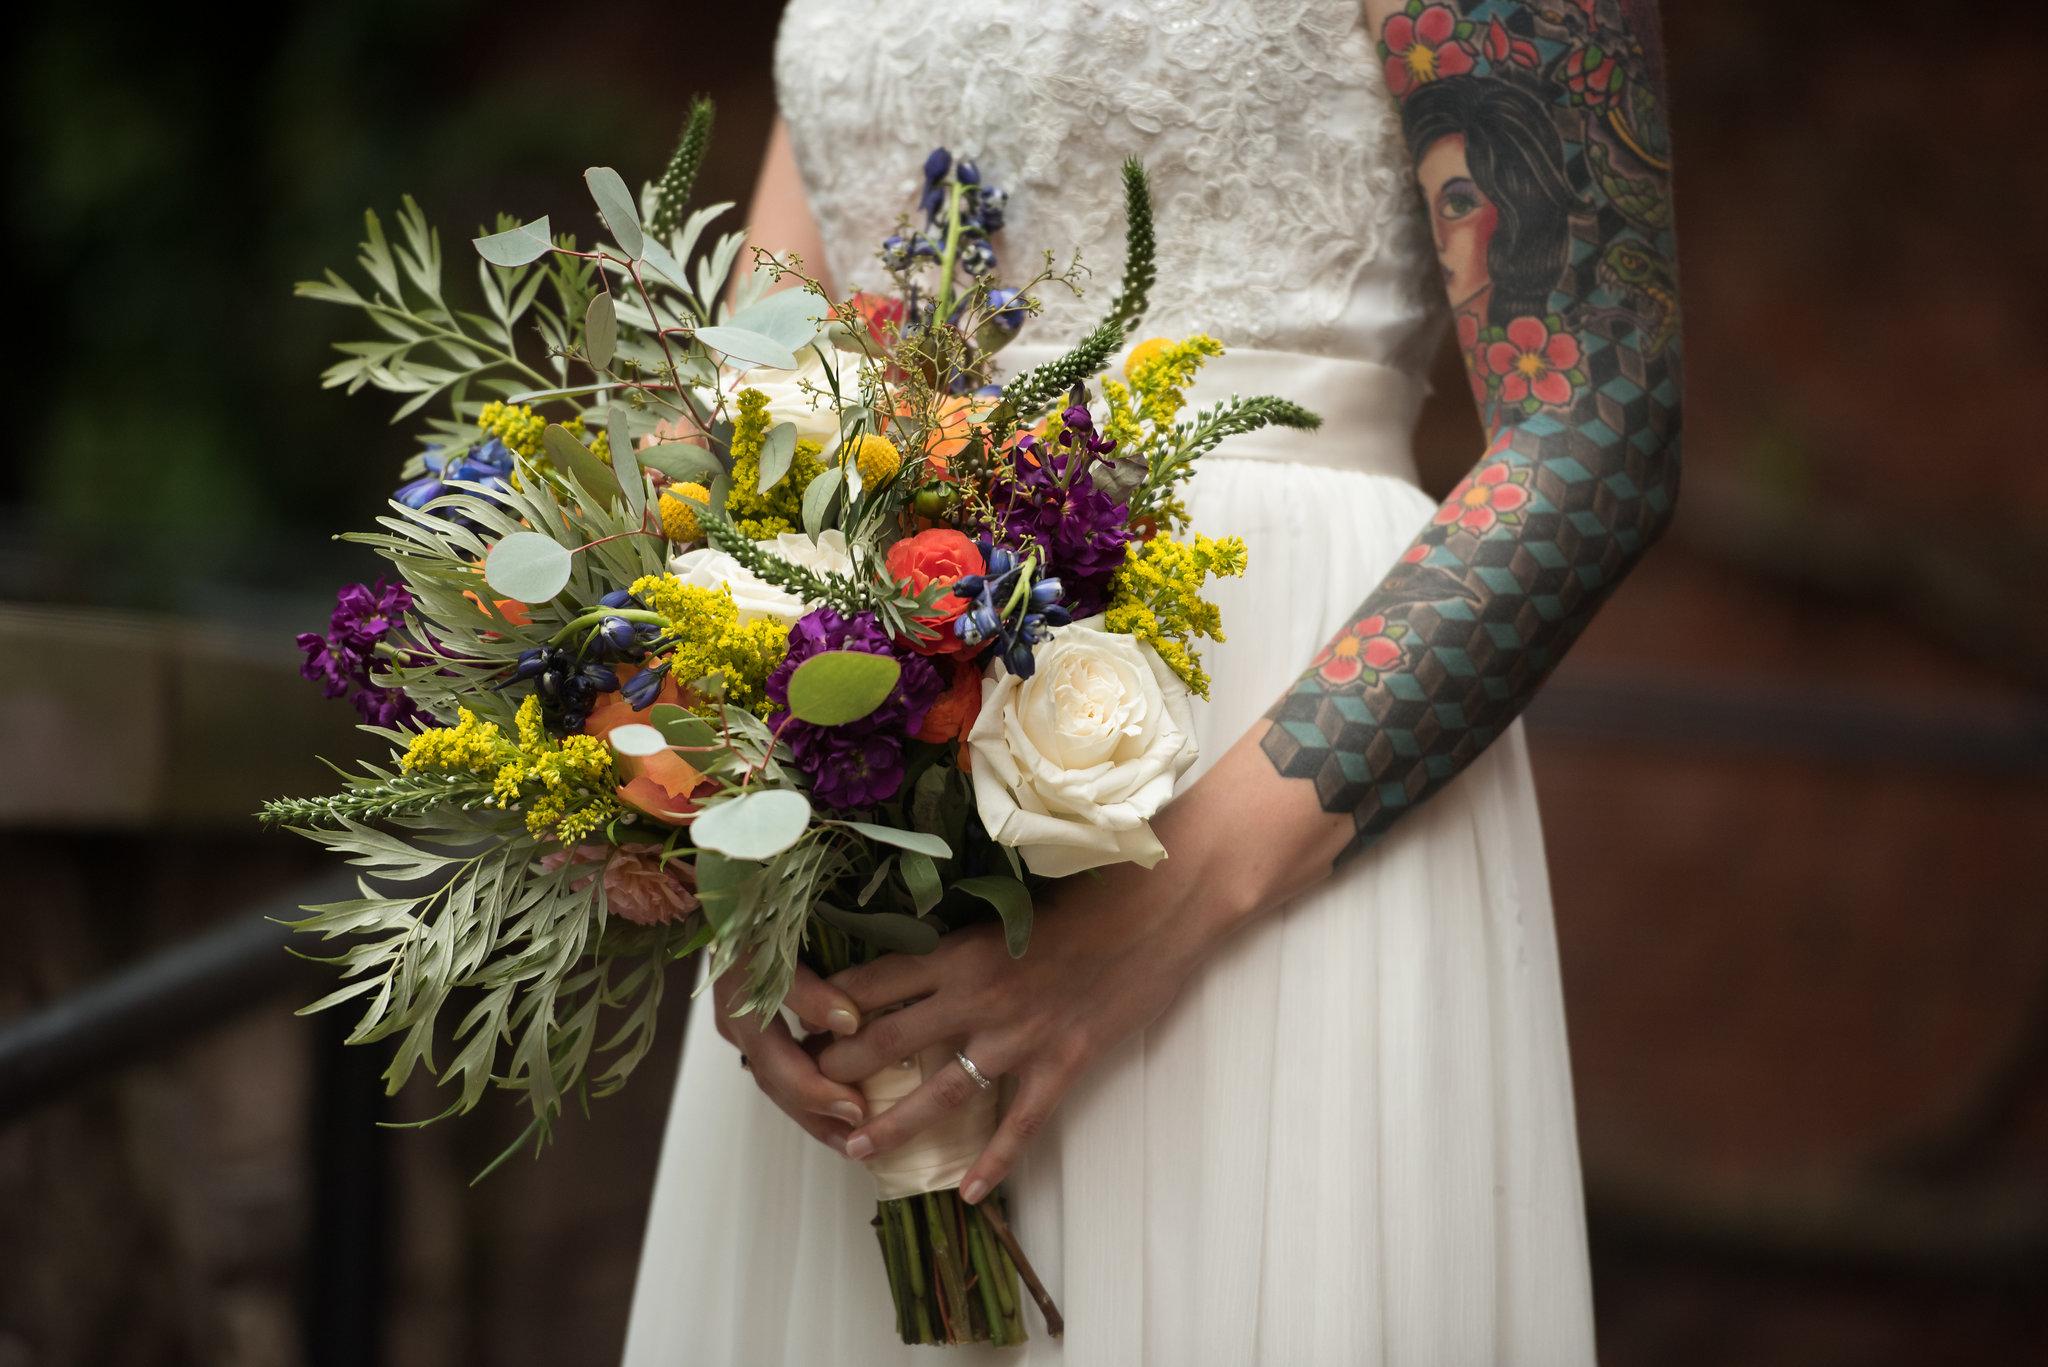 burlington-vermont-wedding-photographer-sarah-annay-photography.jpg3.jpg